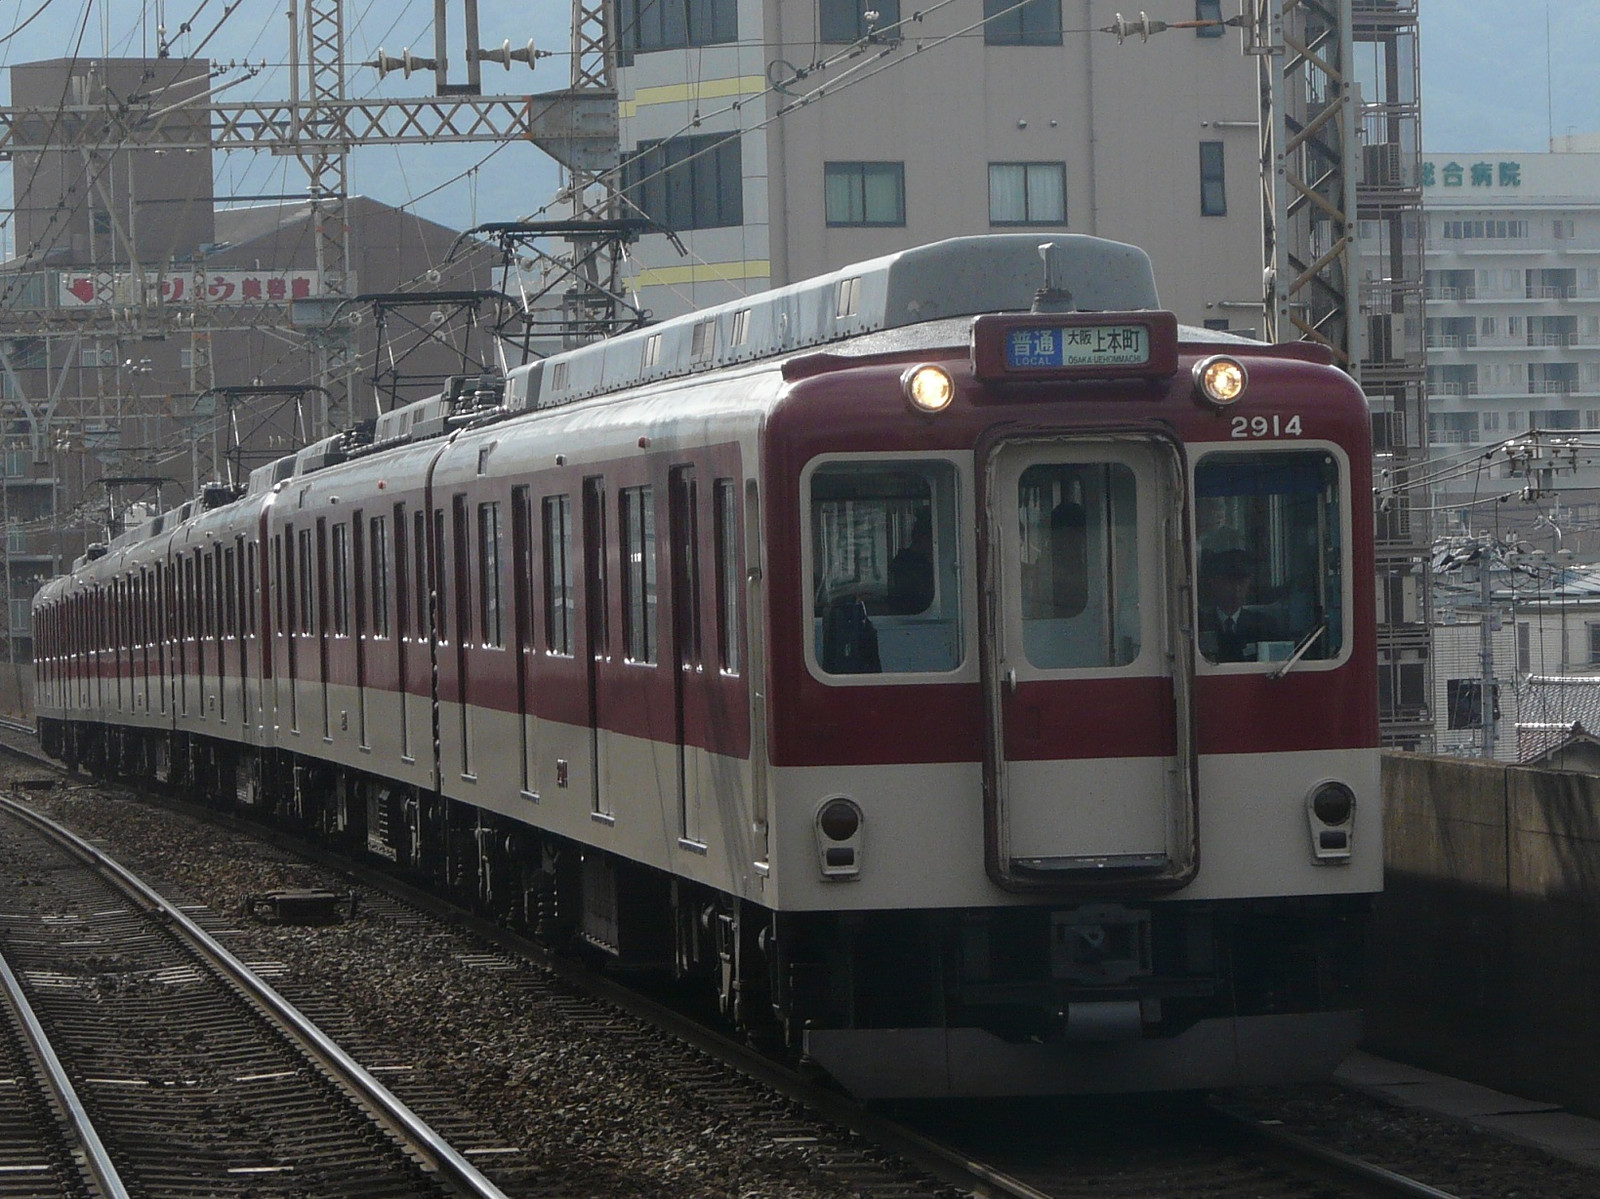 P1220988_2